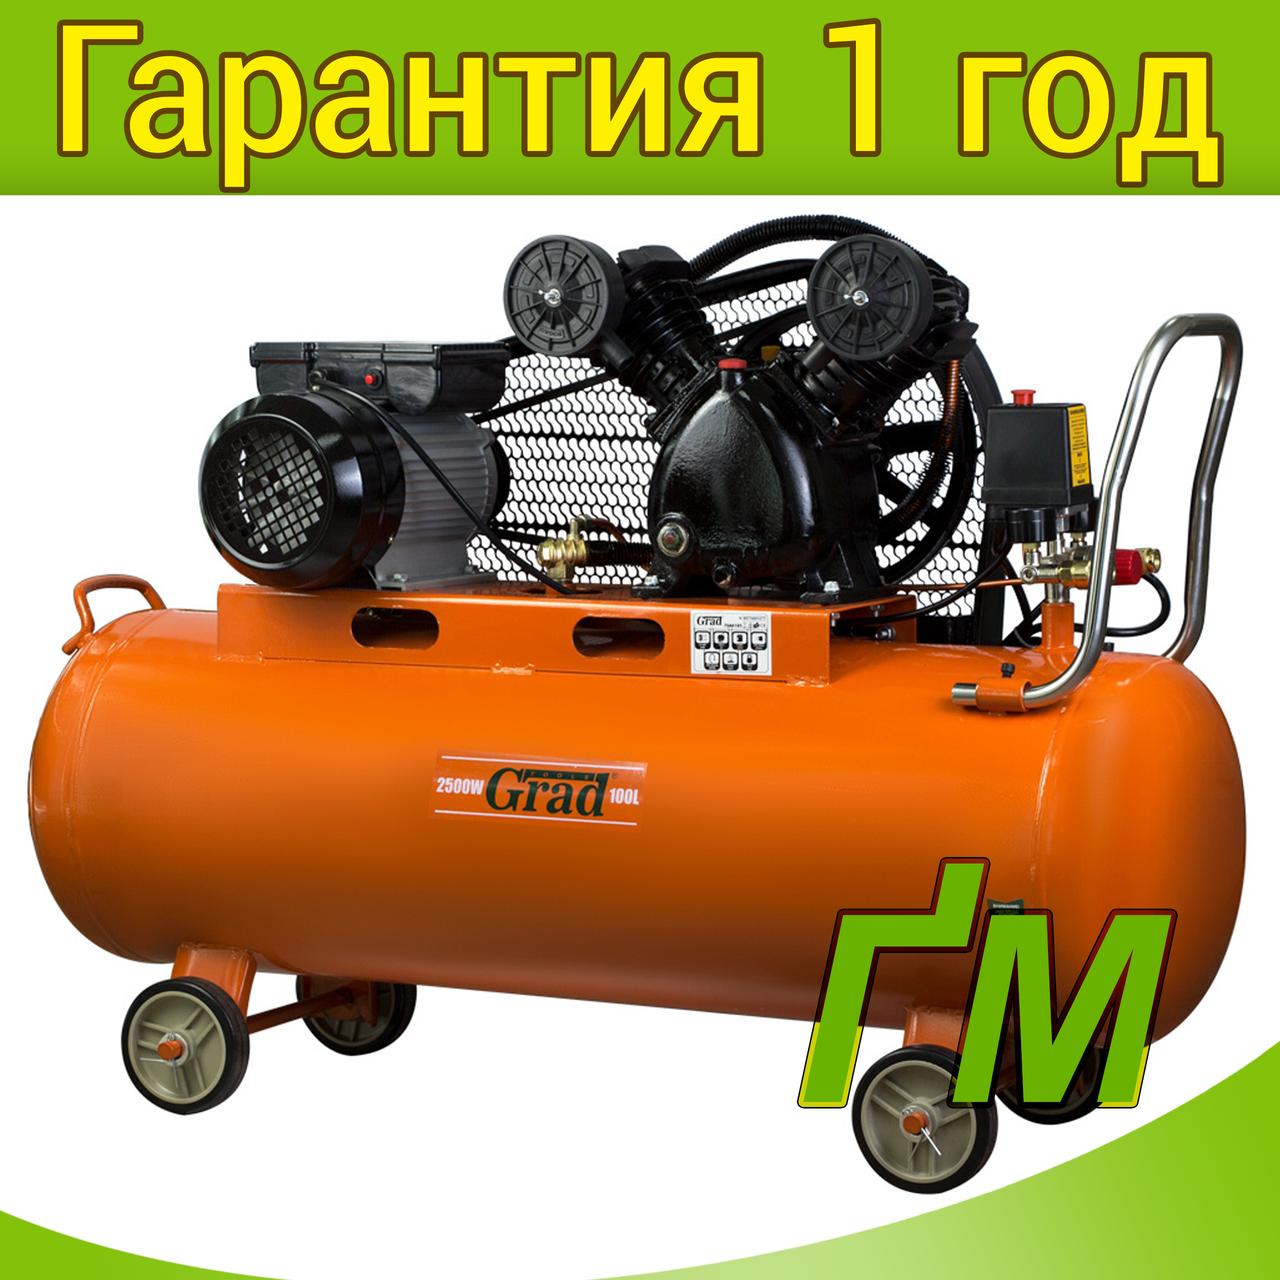 Компрессор ременной V 2.5 кВт, 378 л/мин, 8 бар, 100 л GRAD (2 крана)